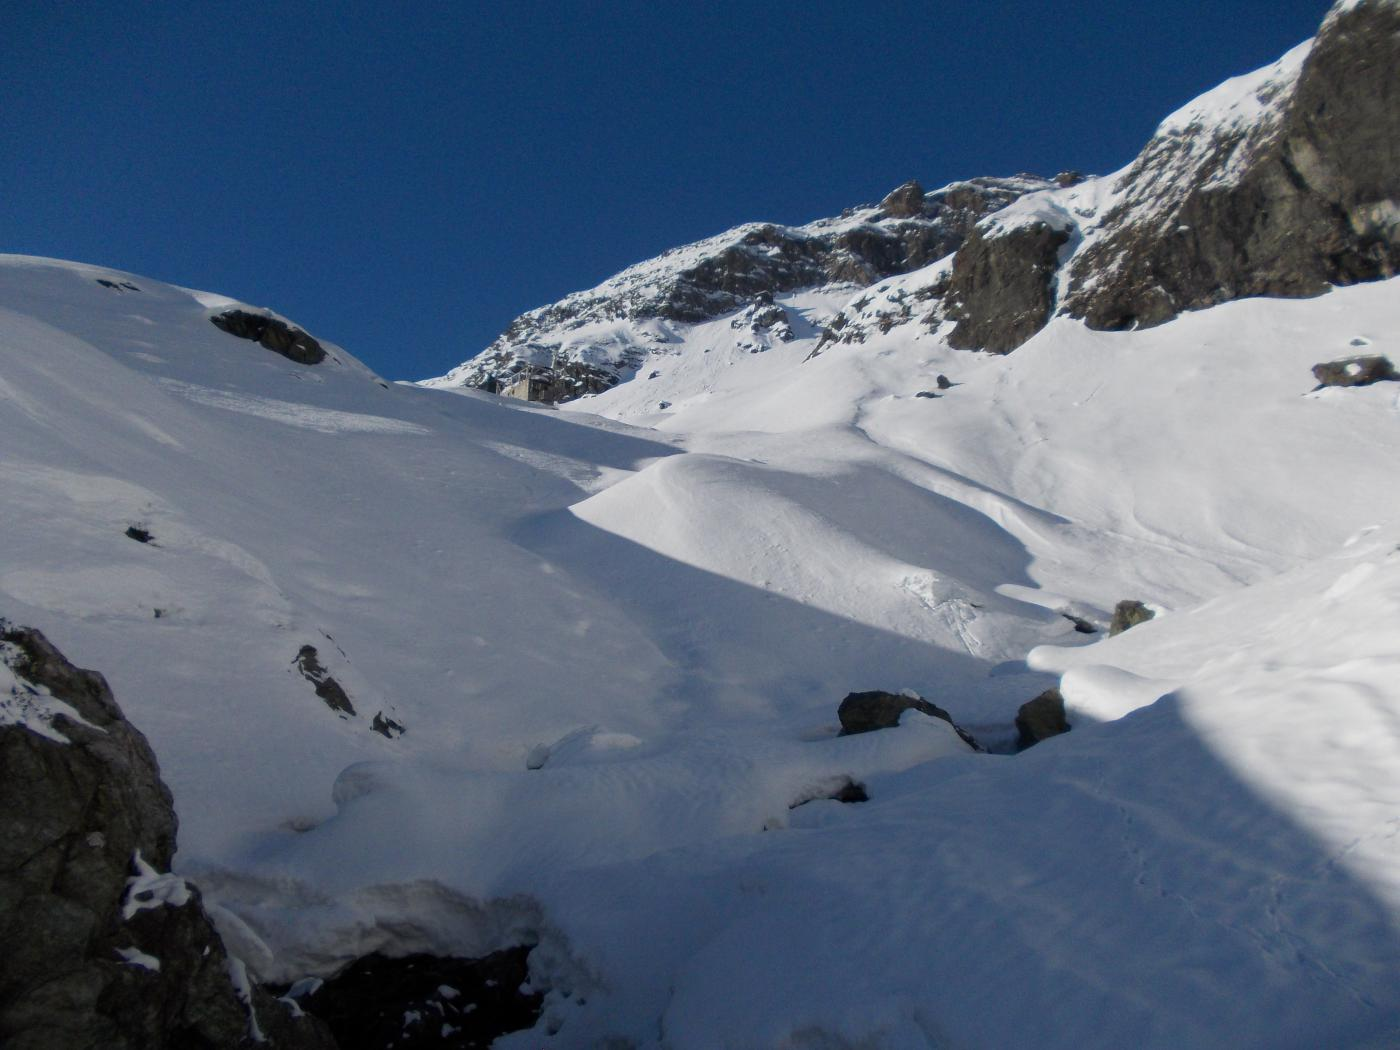 Salita all'Alpe La Balma